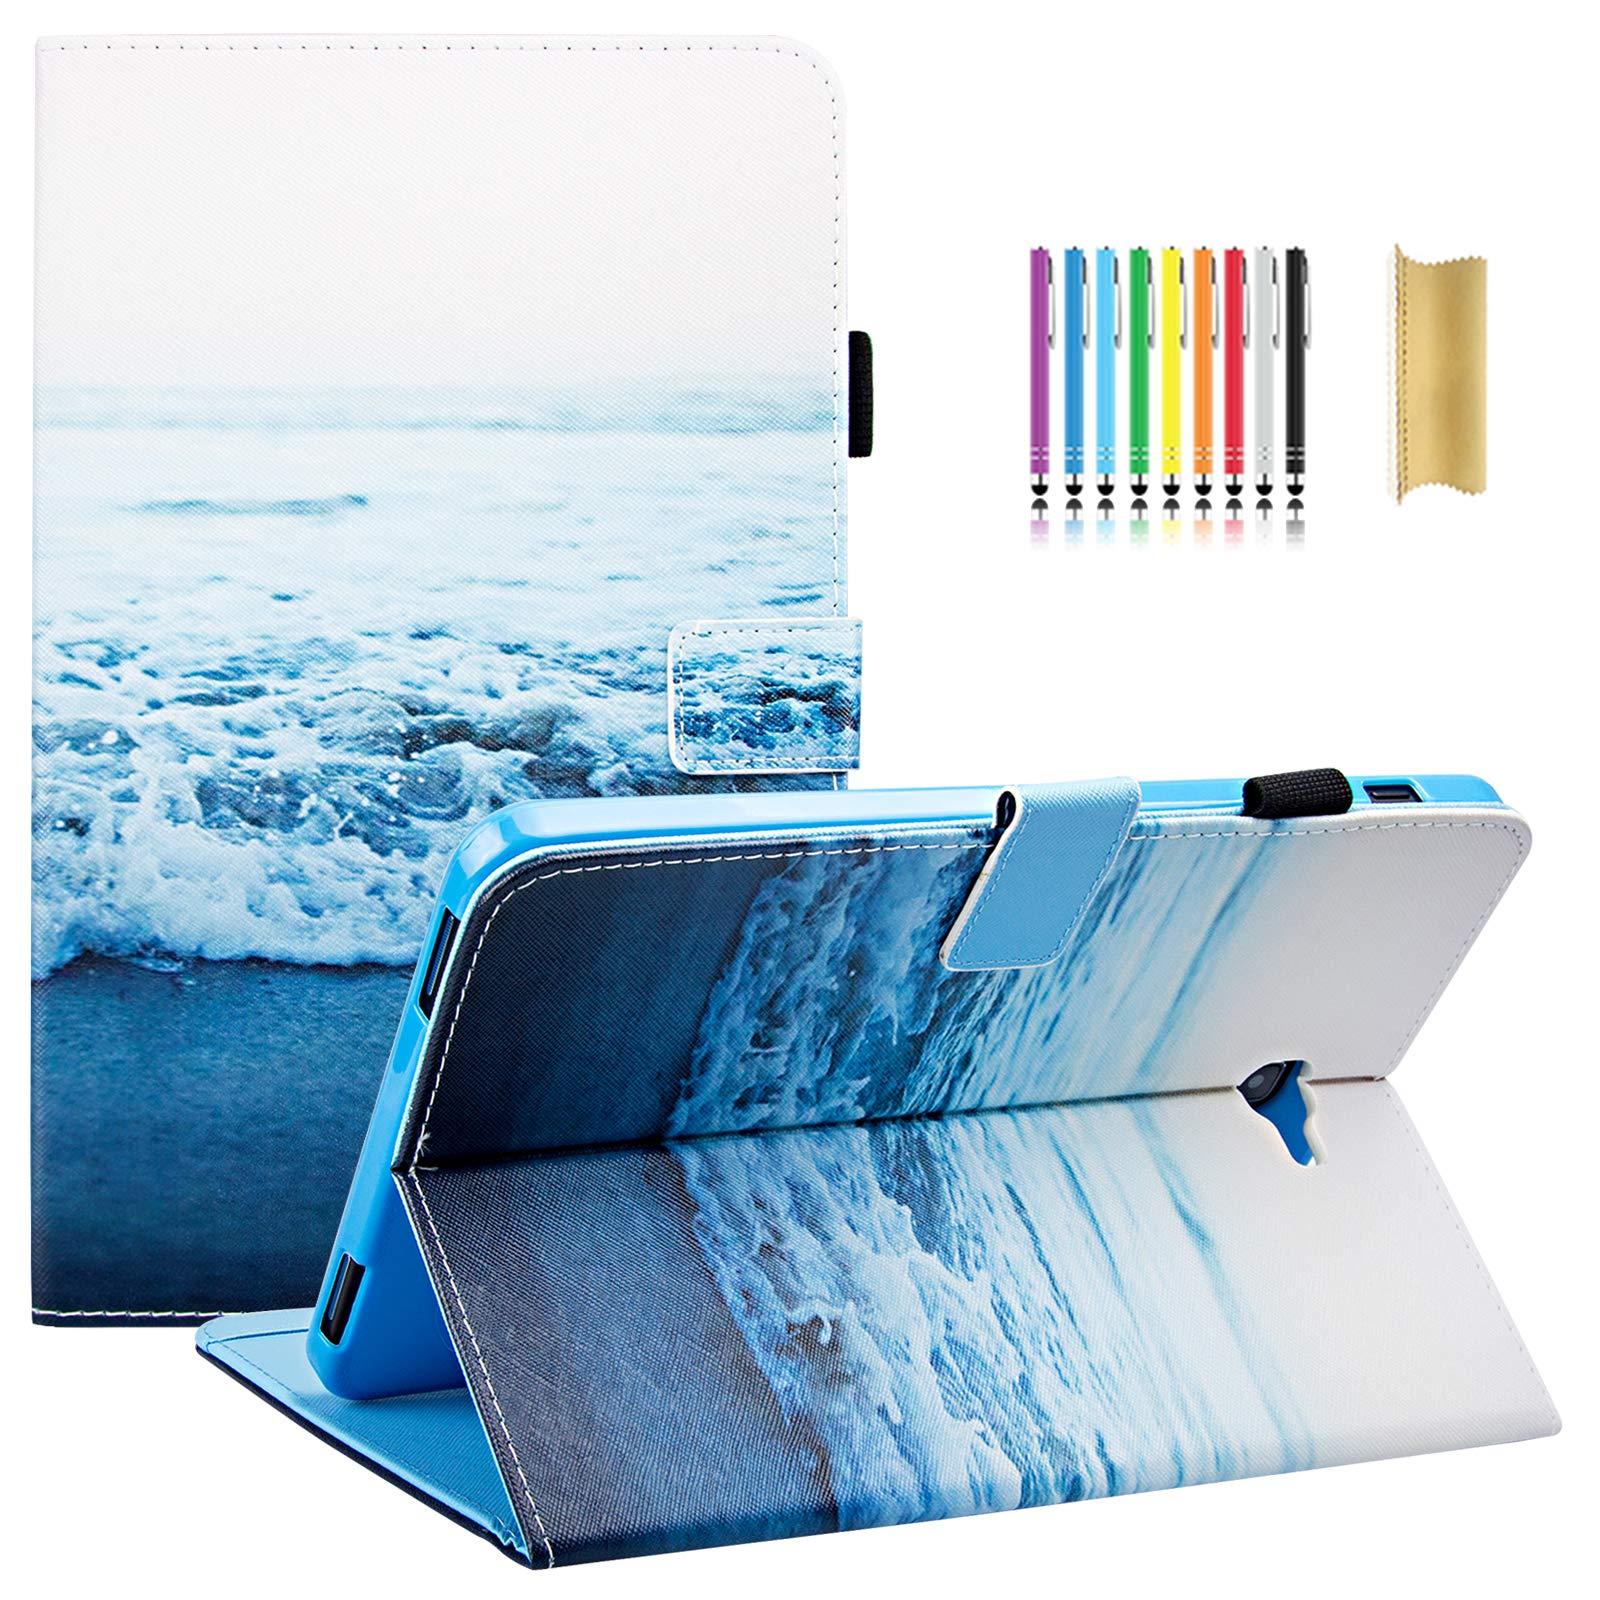 Funda Samsung Galaxy Tab A 10.1 (2016) DTECK [7H4KCMZJ]